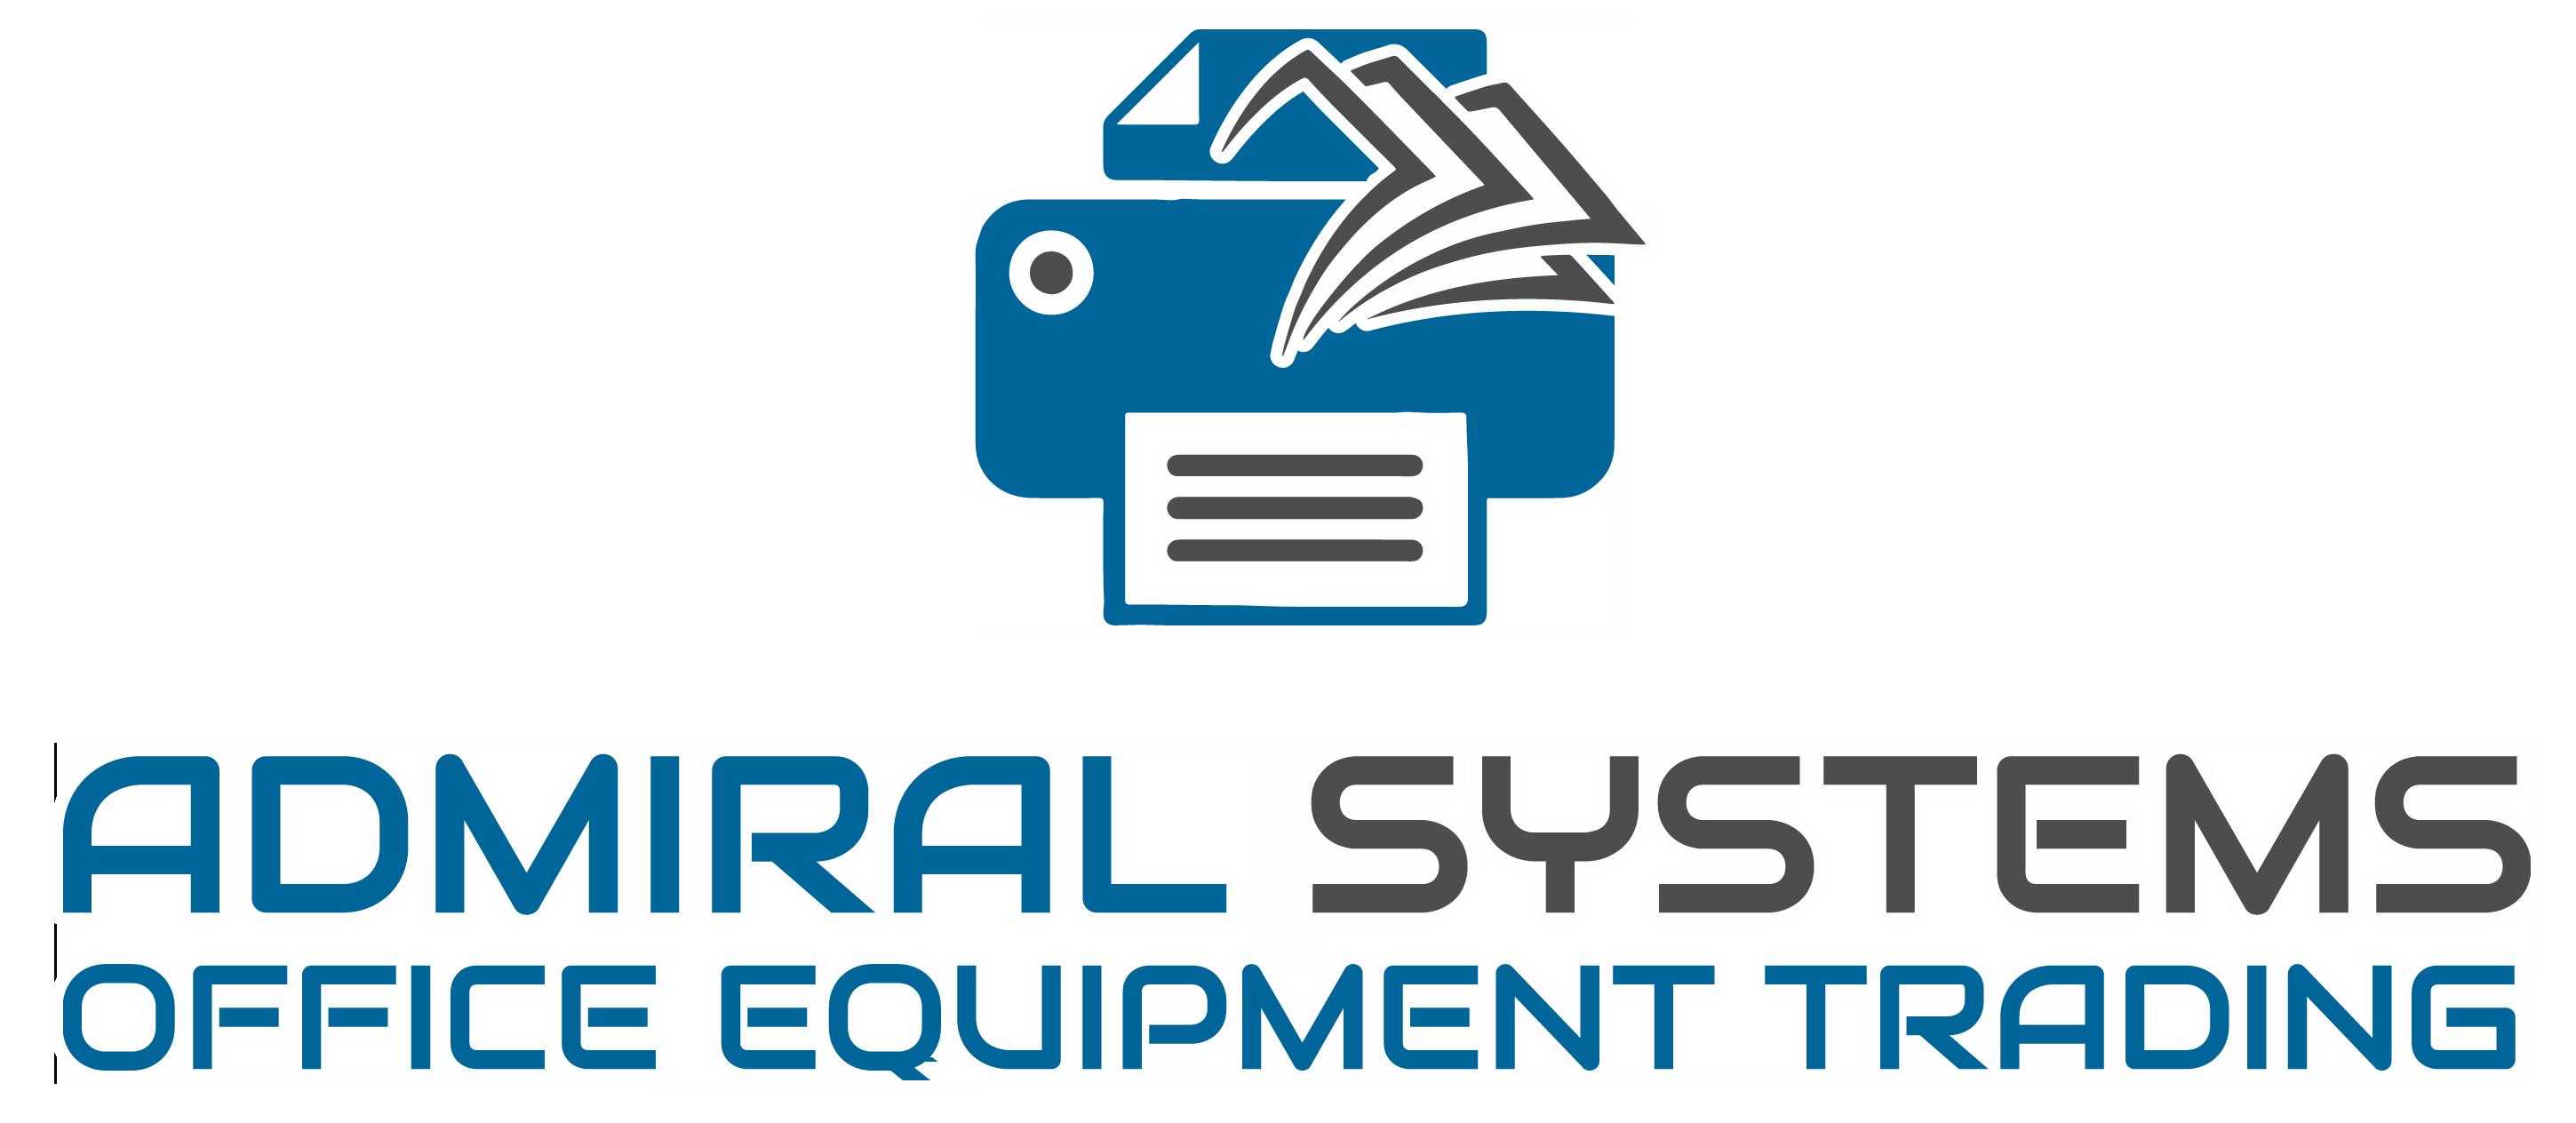 Canon iRAc 3320i (20 ppm) - Admiral Systems Printer Repair